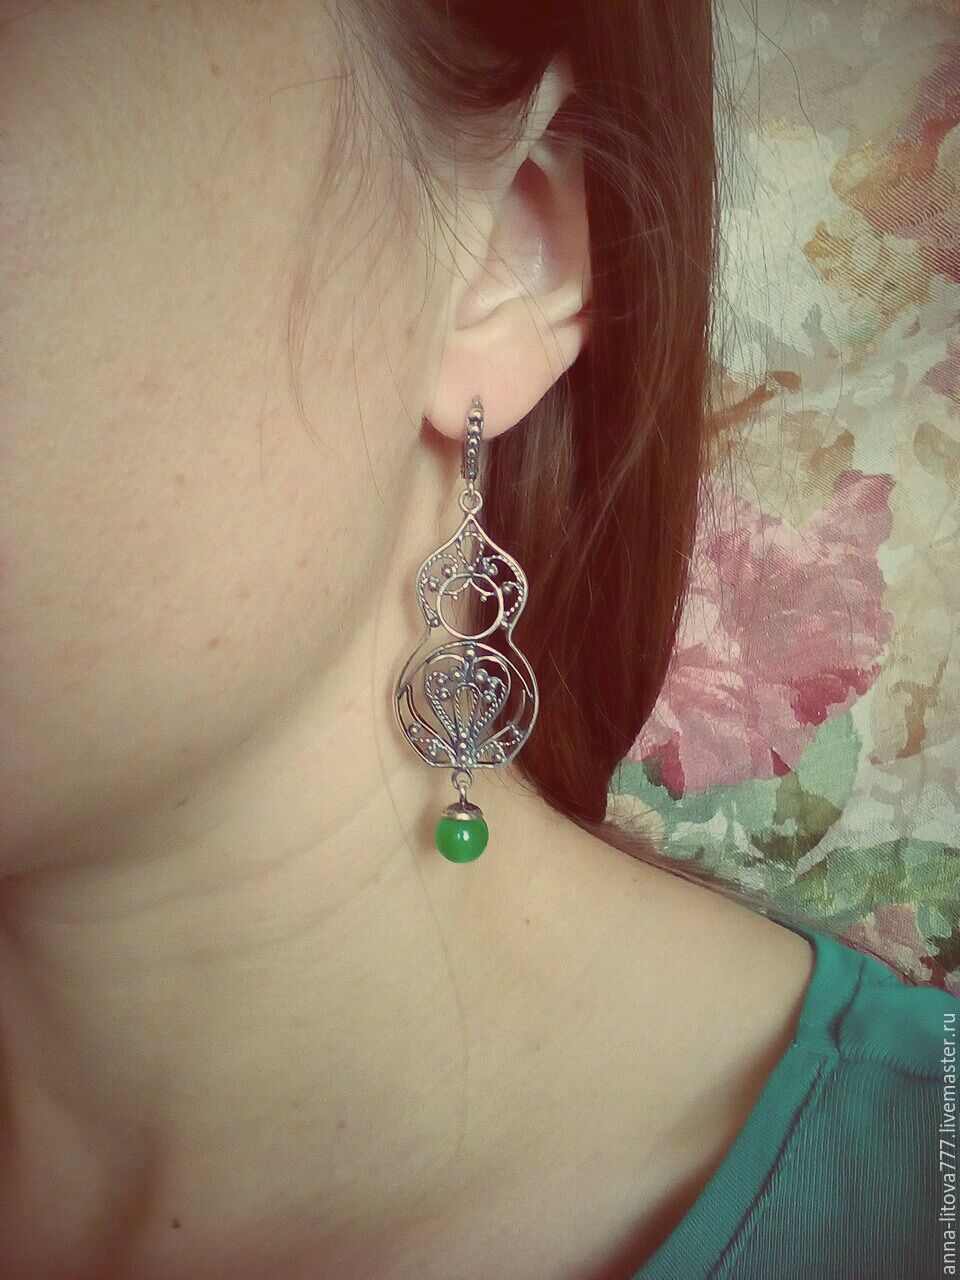 26 Earrings Matryoshka Silvering Anna Litova Litova777